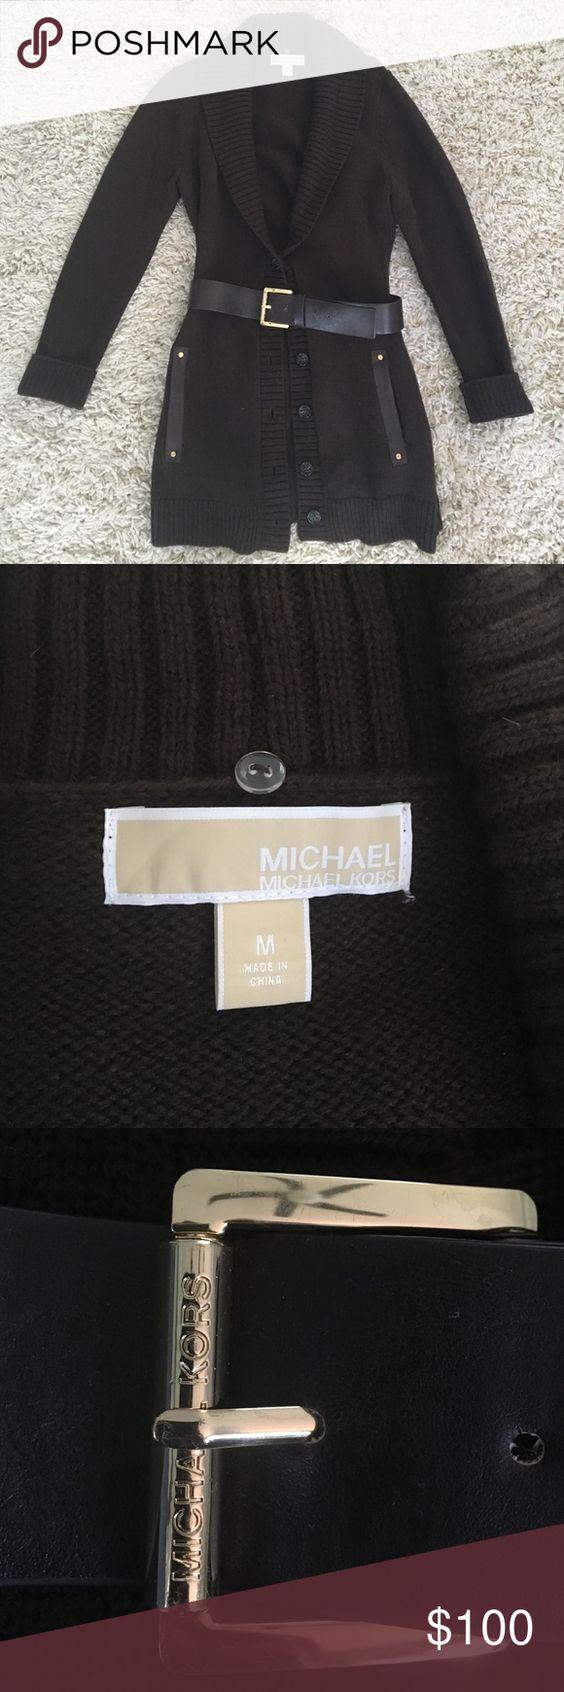 MK cardigan sweater Never worn! Cardigan with detachable belt Michael Kors Sweaters Cardigans